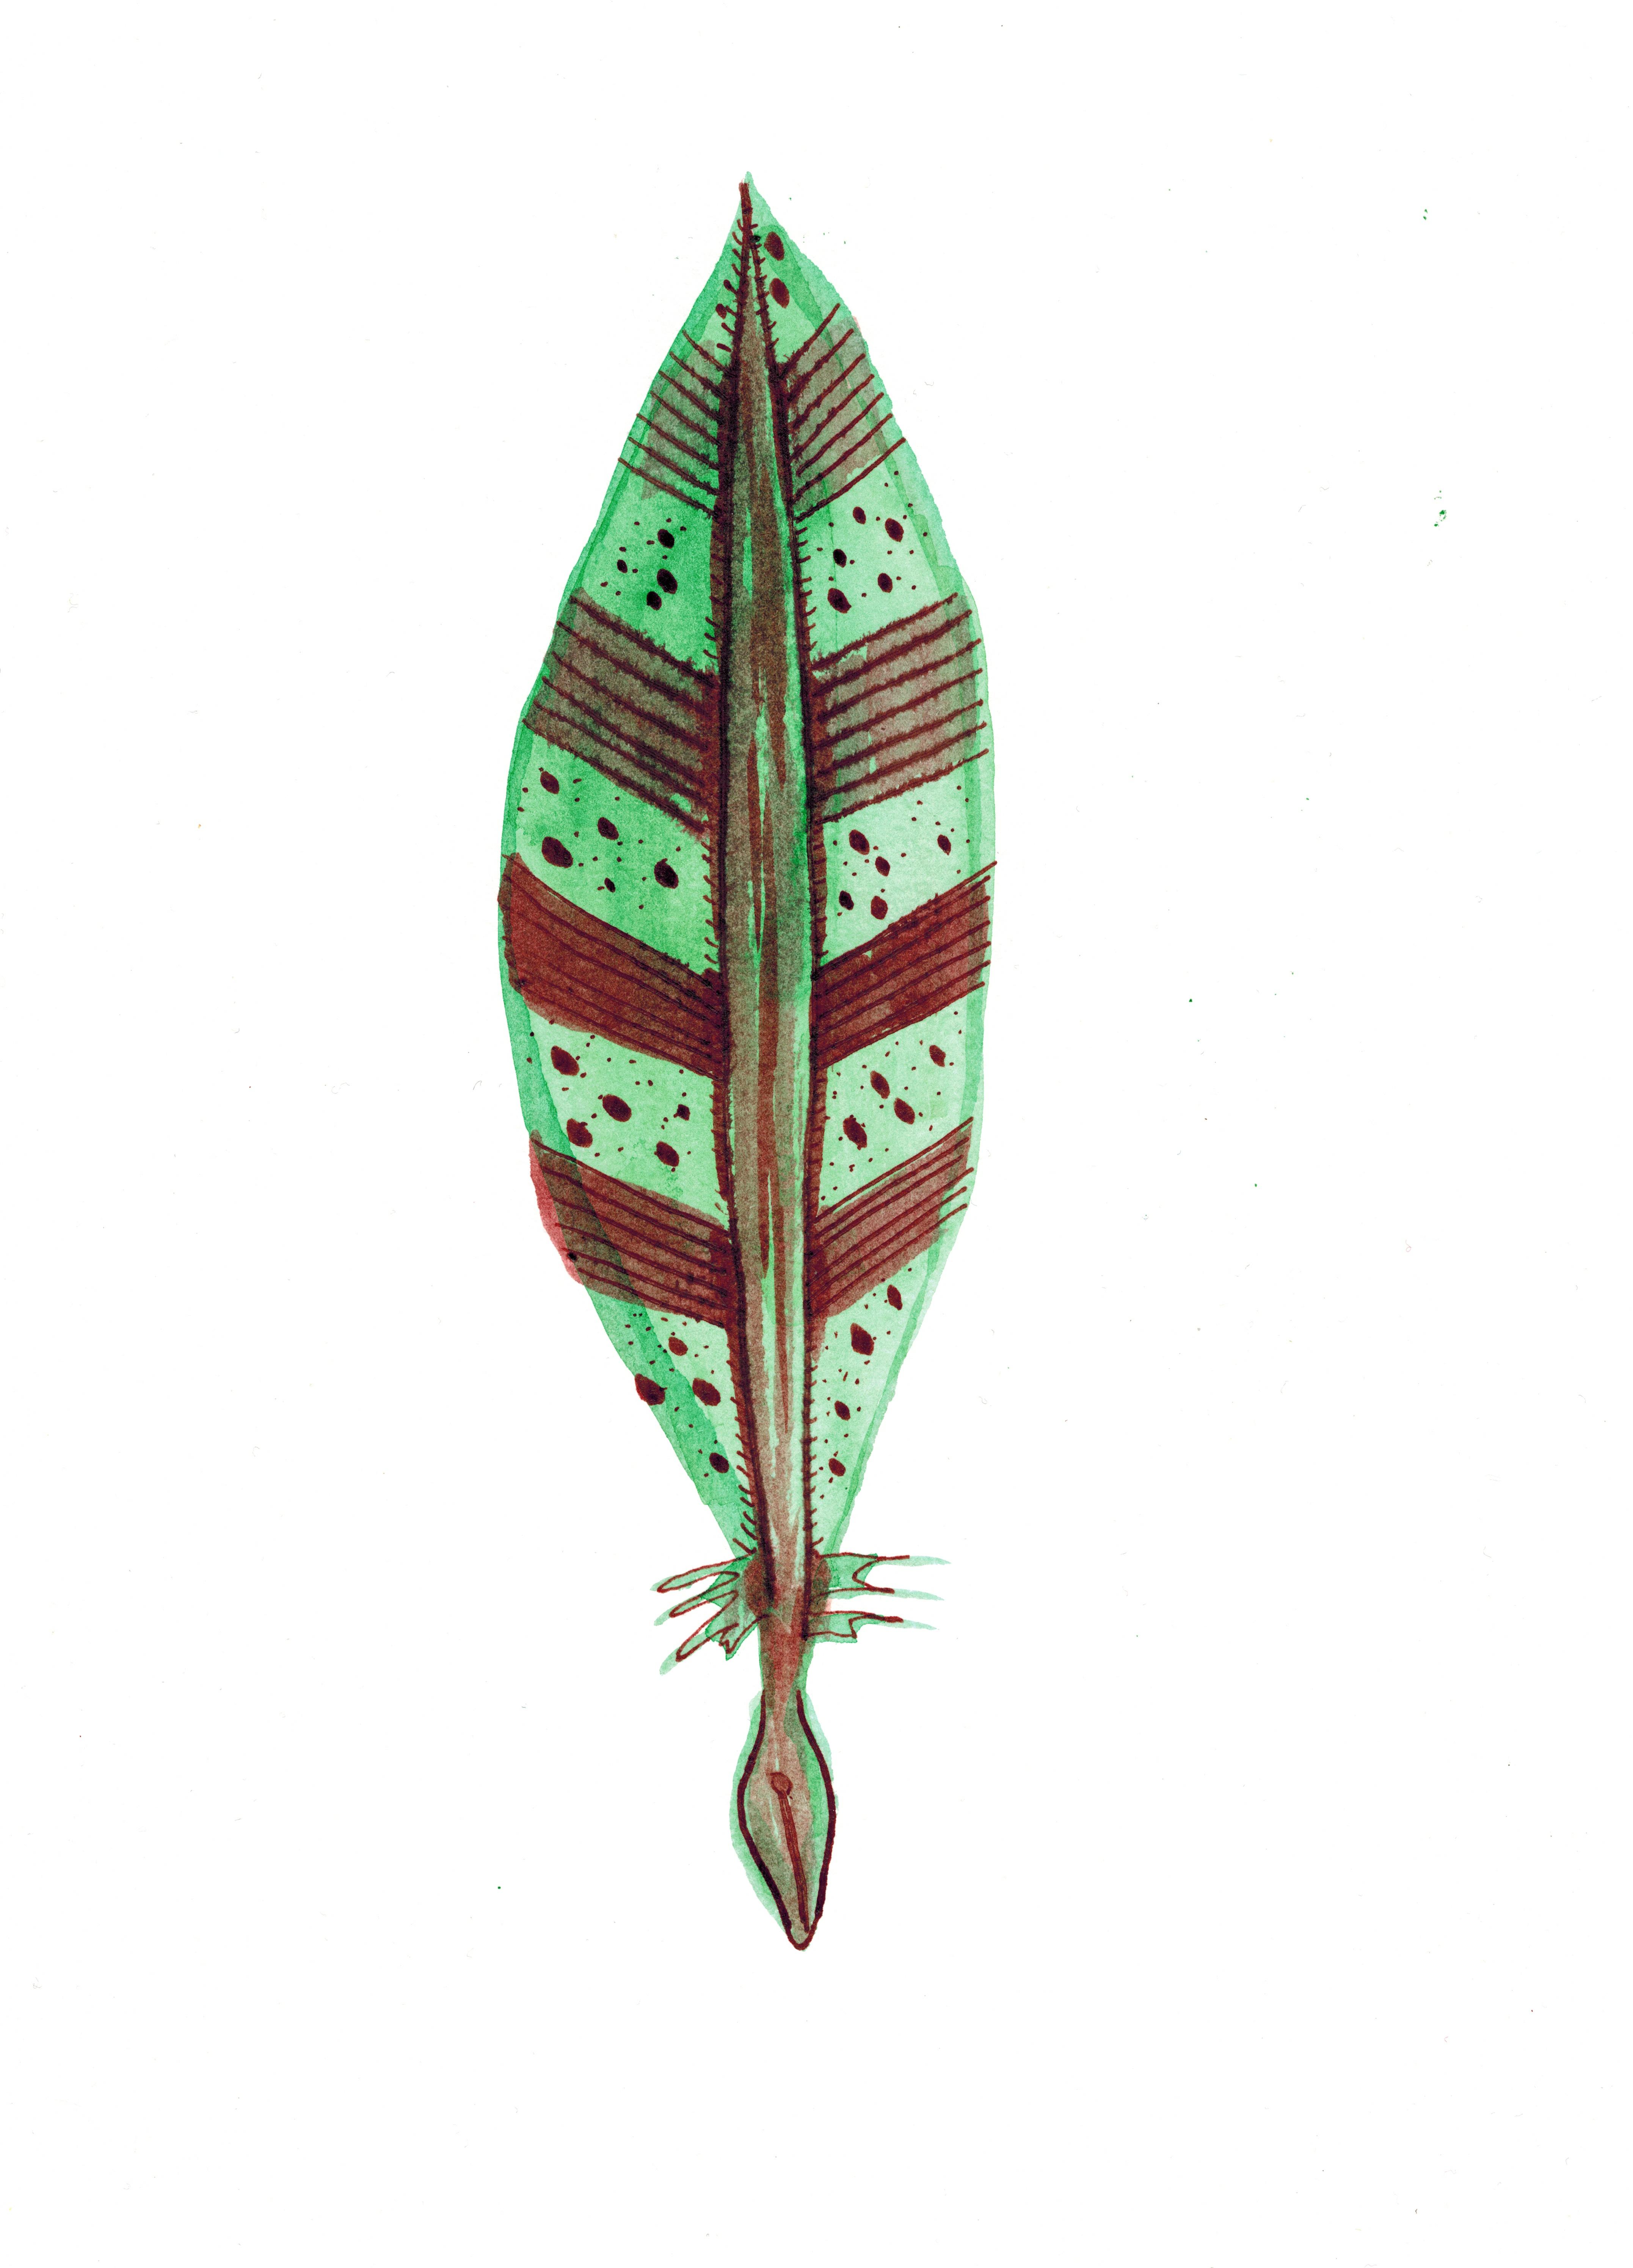 4307x5981 Emerald Quill Dip Pen Drawing Watercolor Wishlist Art